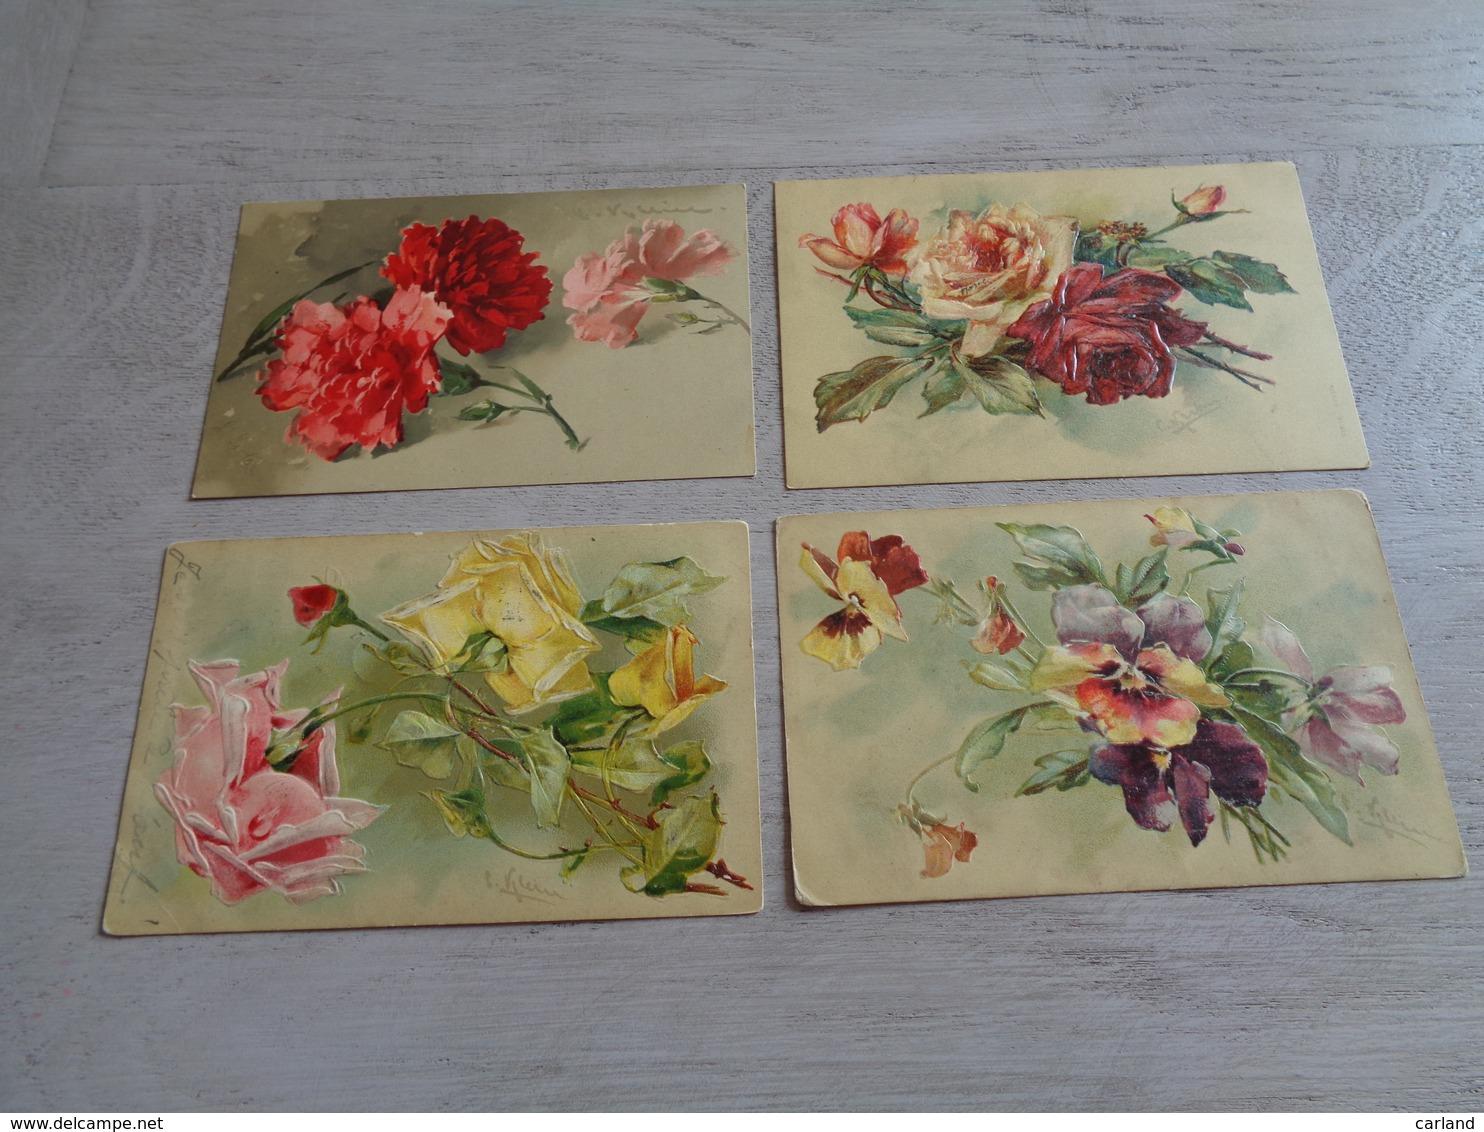 Beau Lot De 20 Cartes Postales De Fantaisie Illustrateur Catharina Klein  Mooi Lot Van 20 Postkaarten Van Fantasie Klein - Cartes Postales